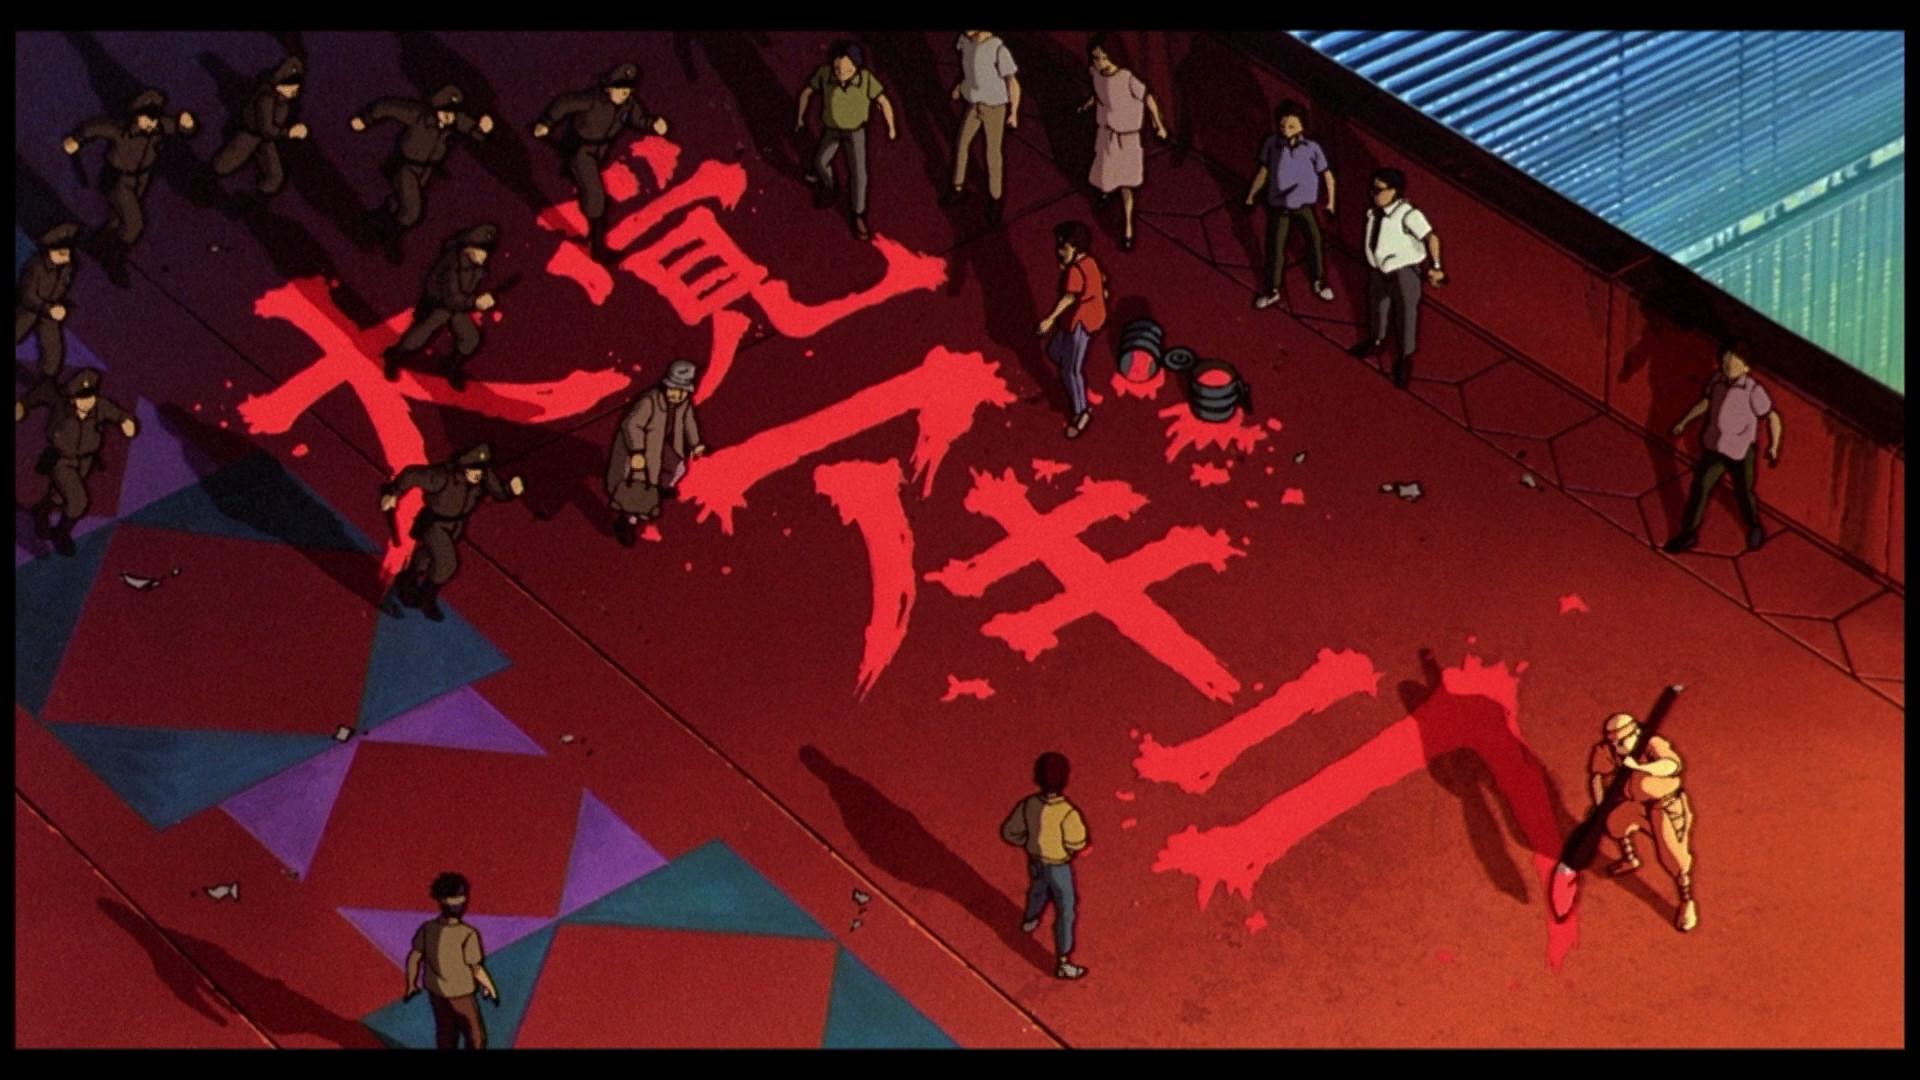 akira images akira screencap hd wallpaper and background